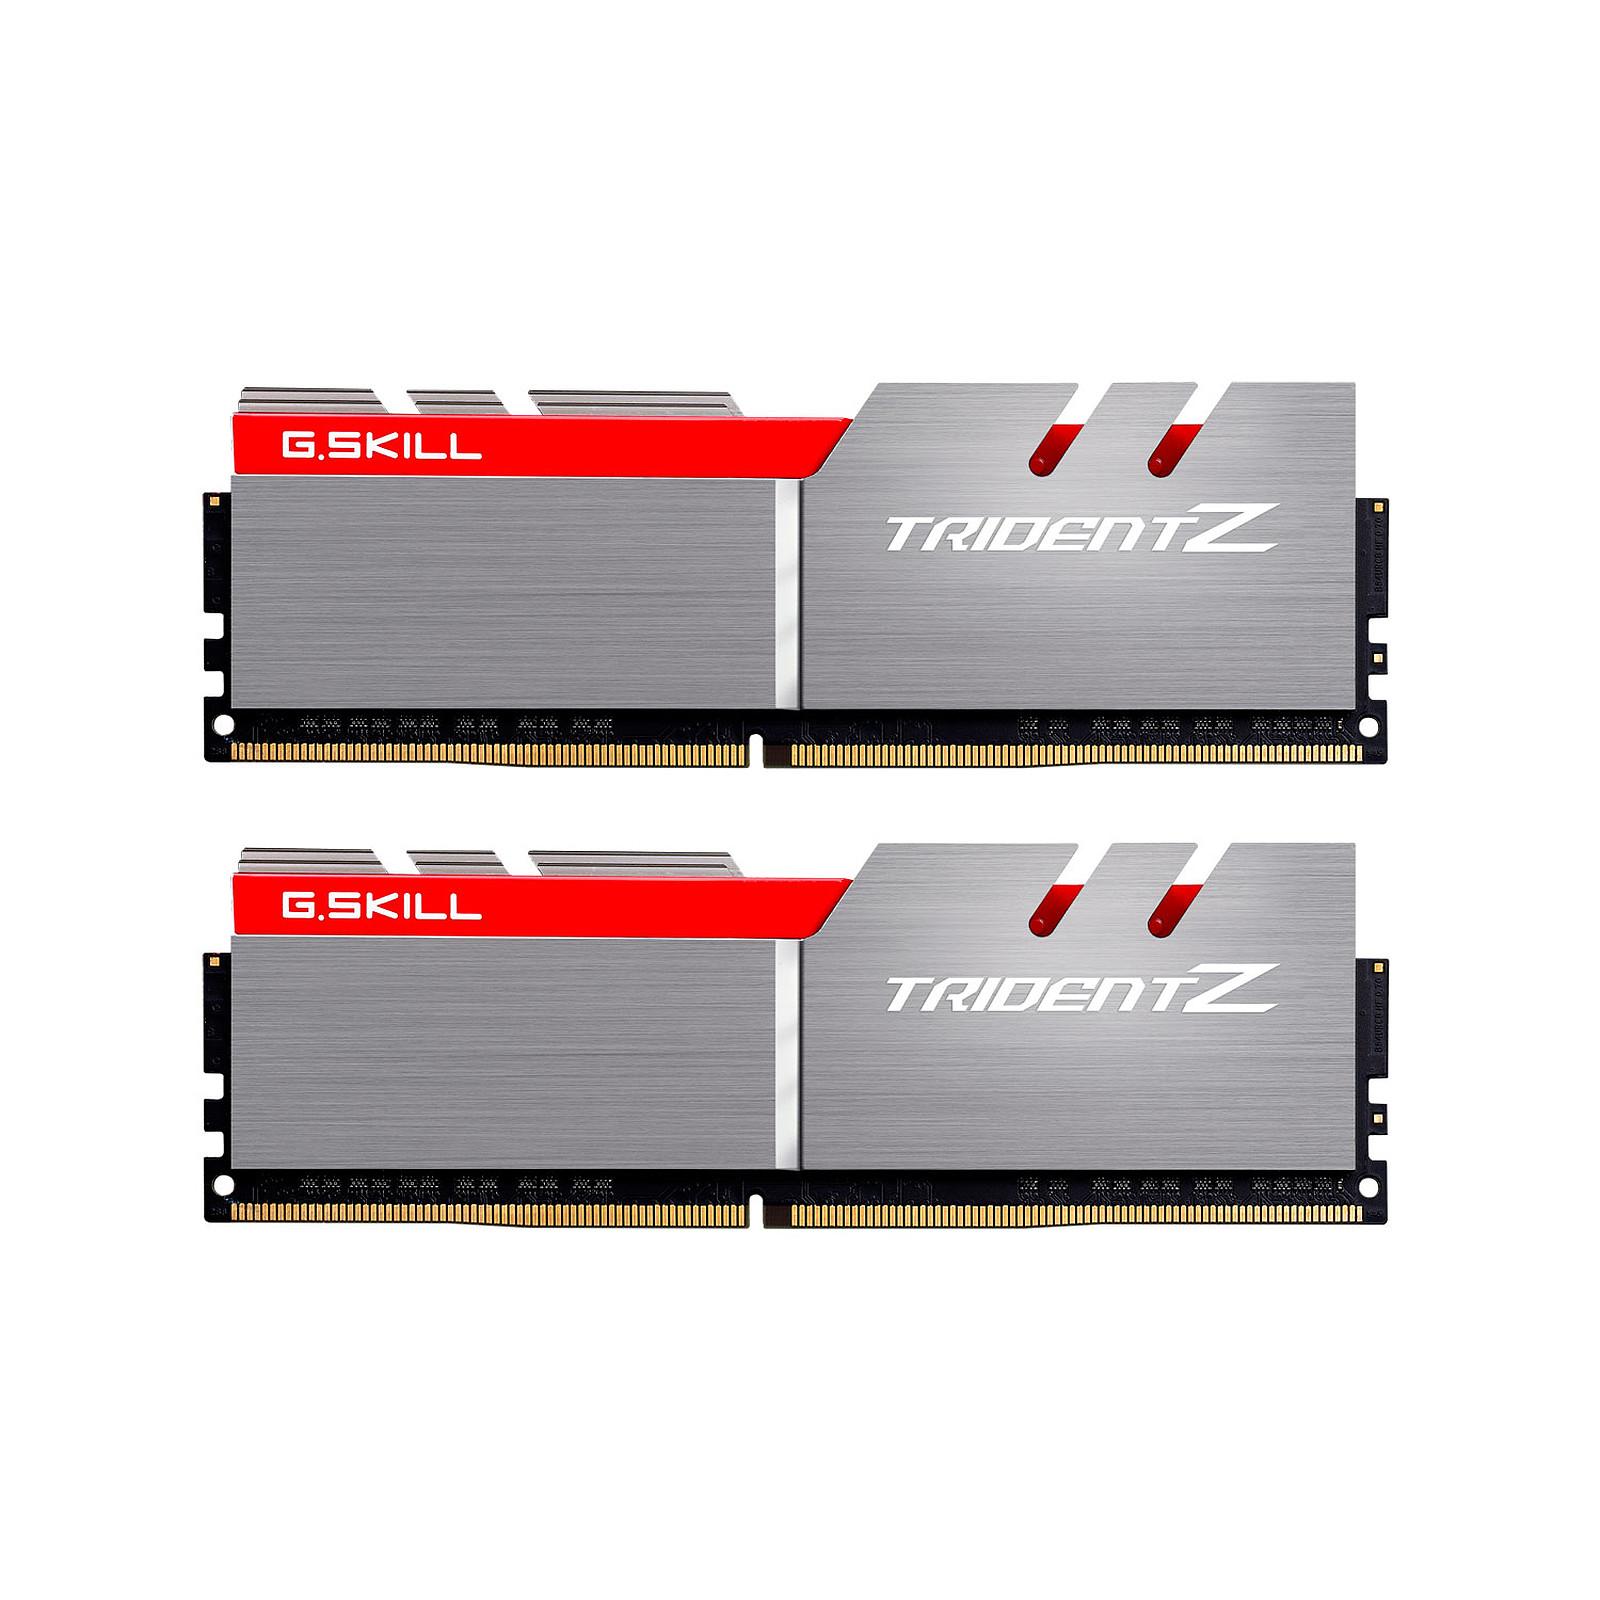 G.Skill Trident Z 32 Go (2x 16 Go) DDR4 2800 MHz CL14